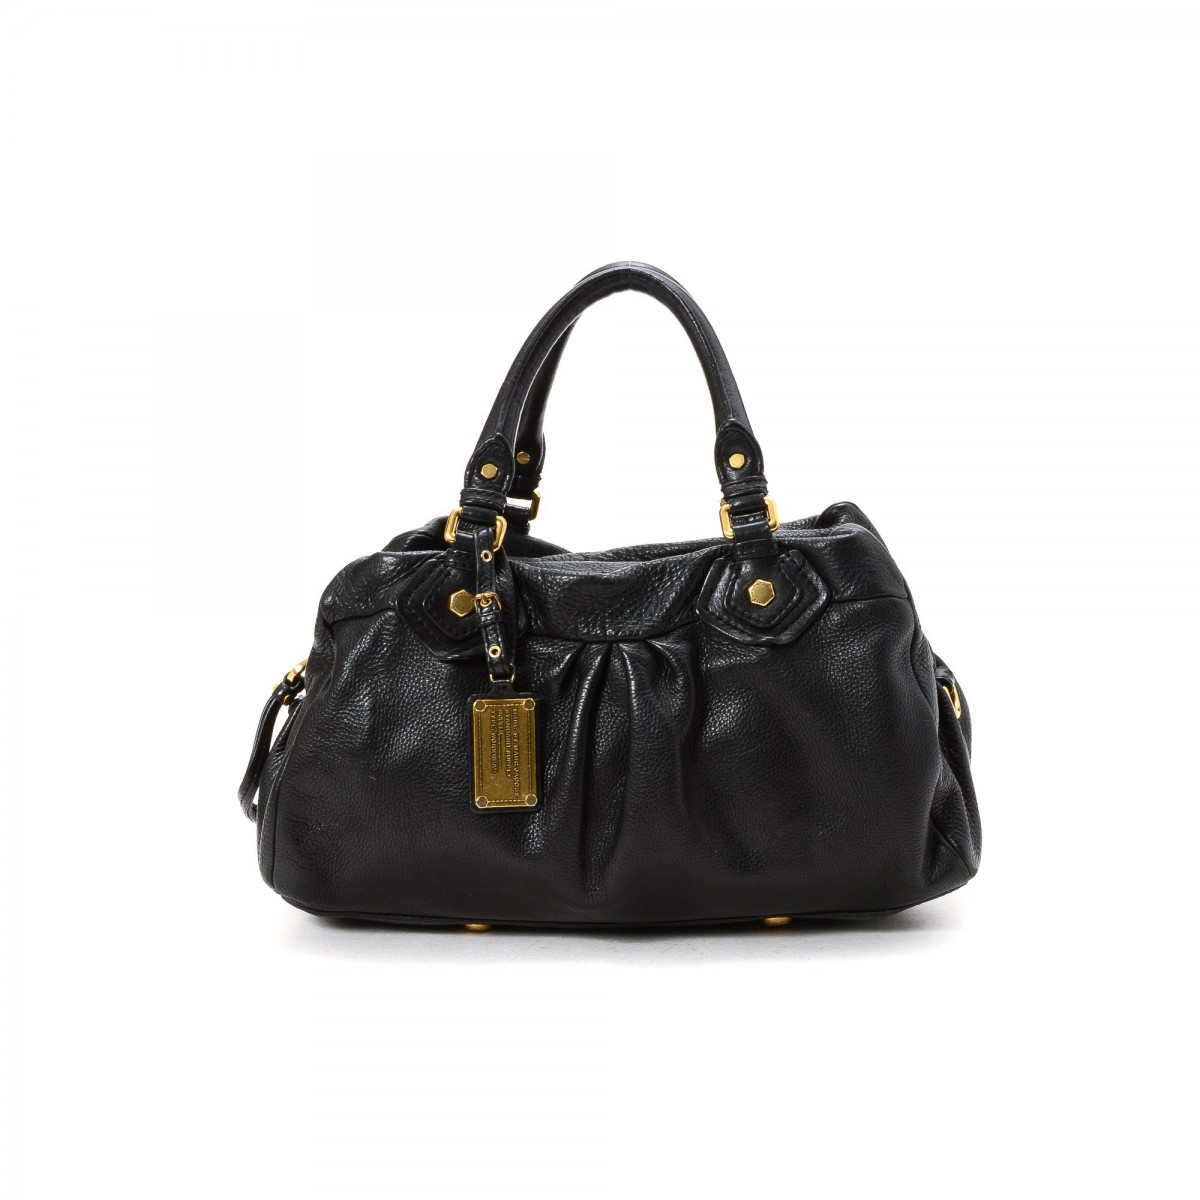 marc-by-marc-jacobs-2-way-bag-black-leather-handbag-7210a8.jpg